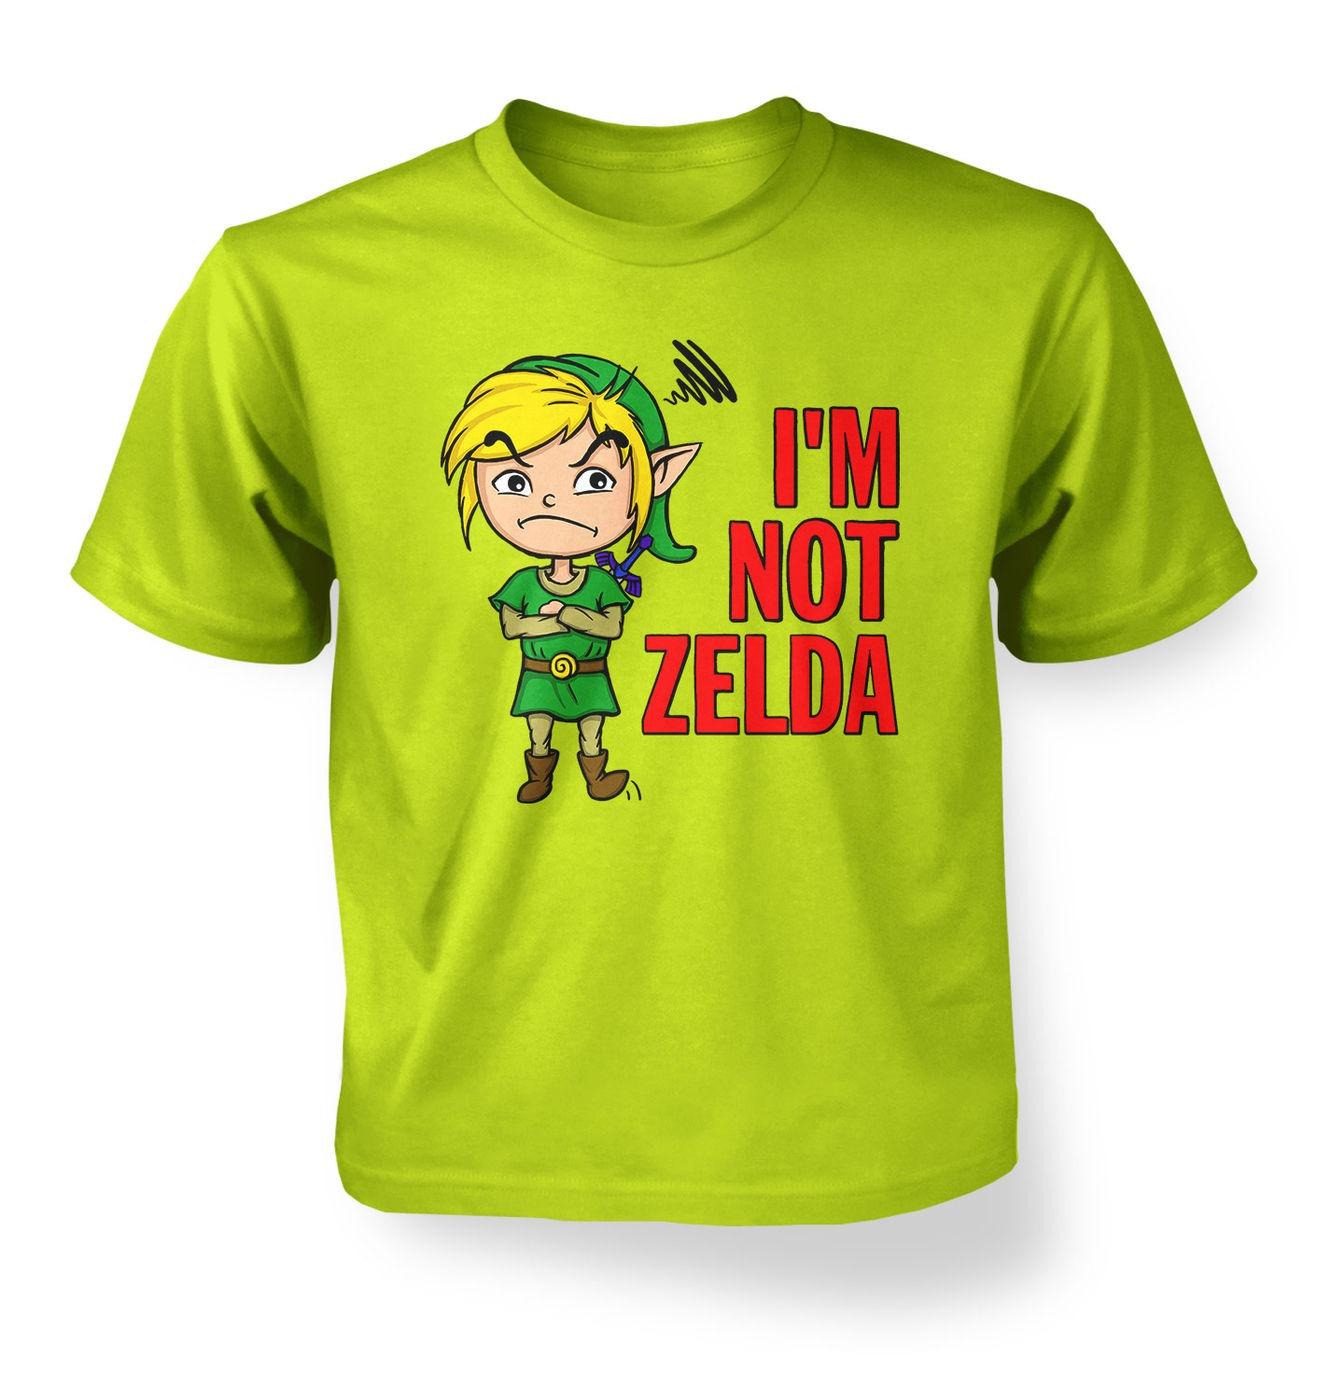 Not Zelda kids t-shirt by Something Geeky